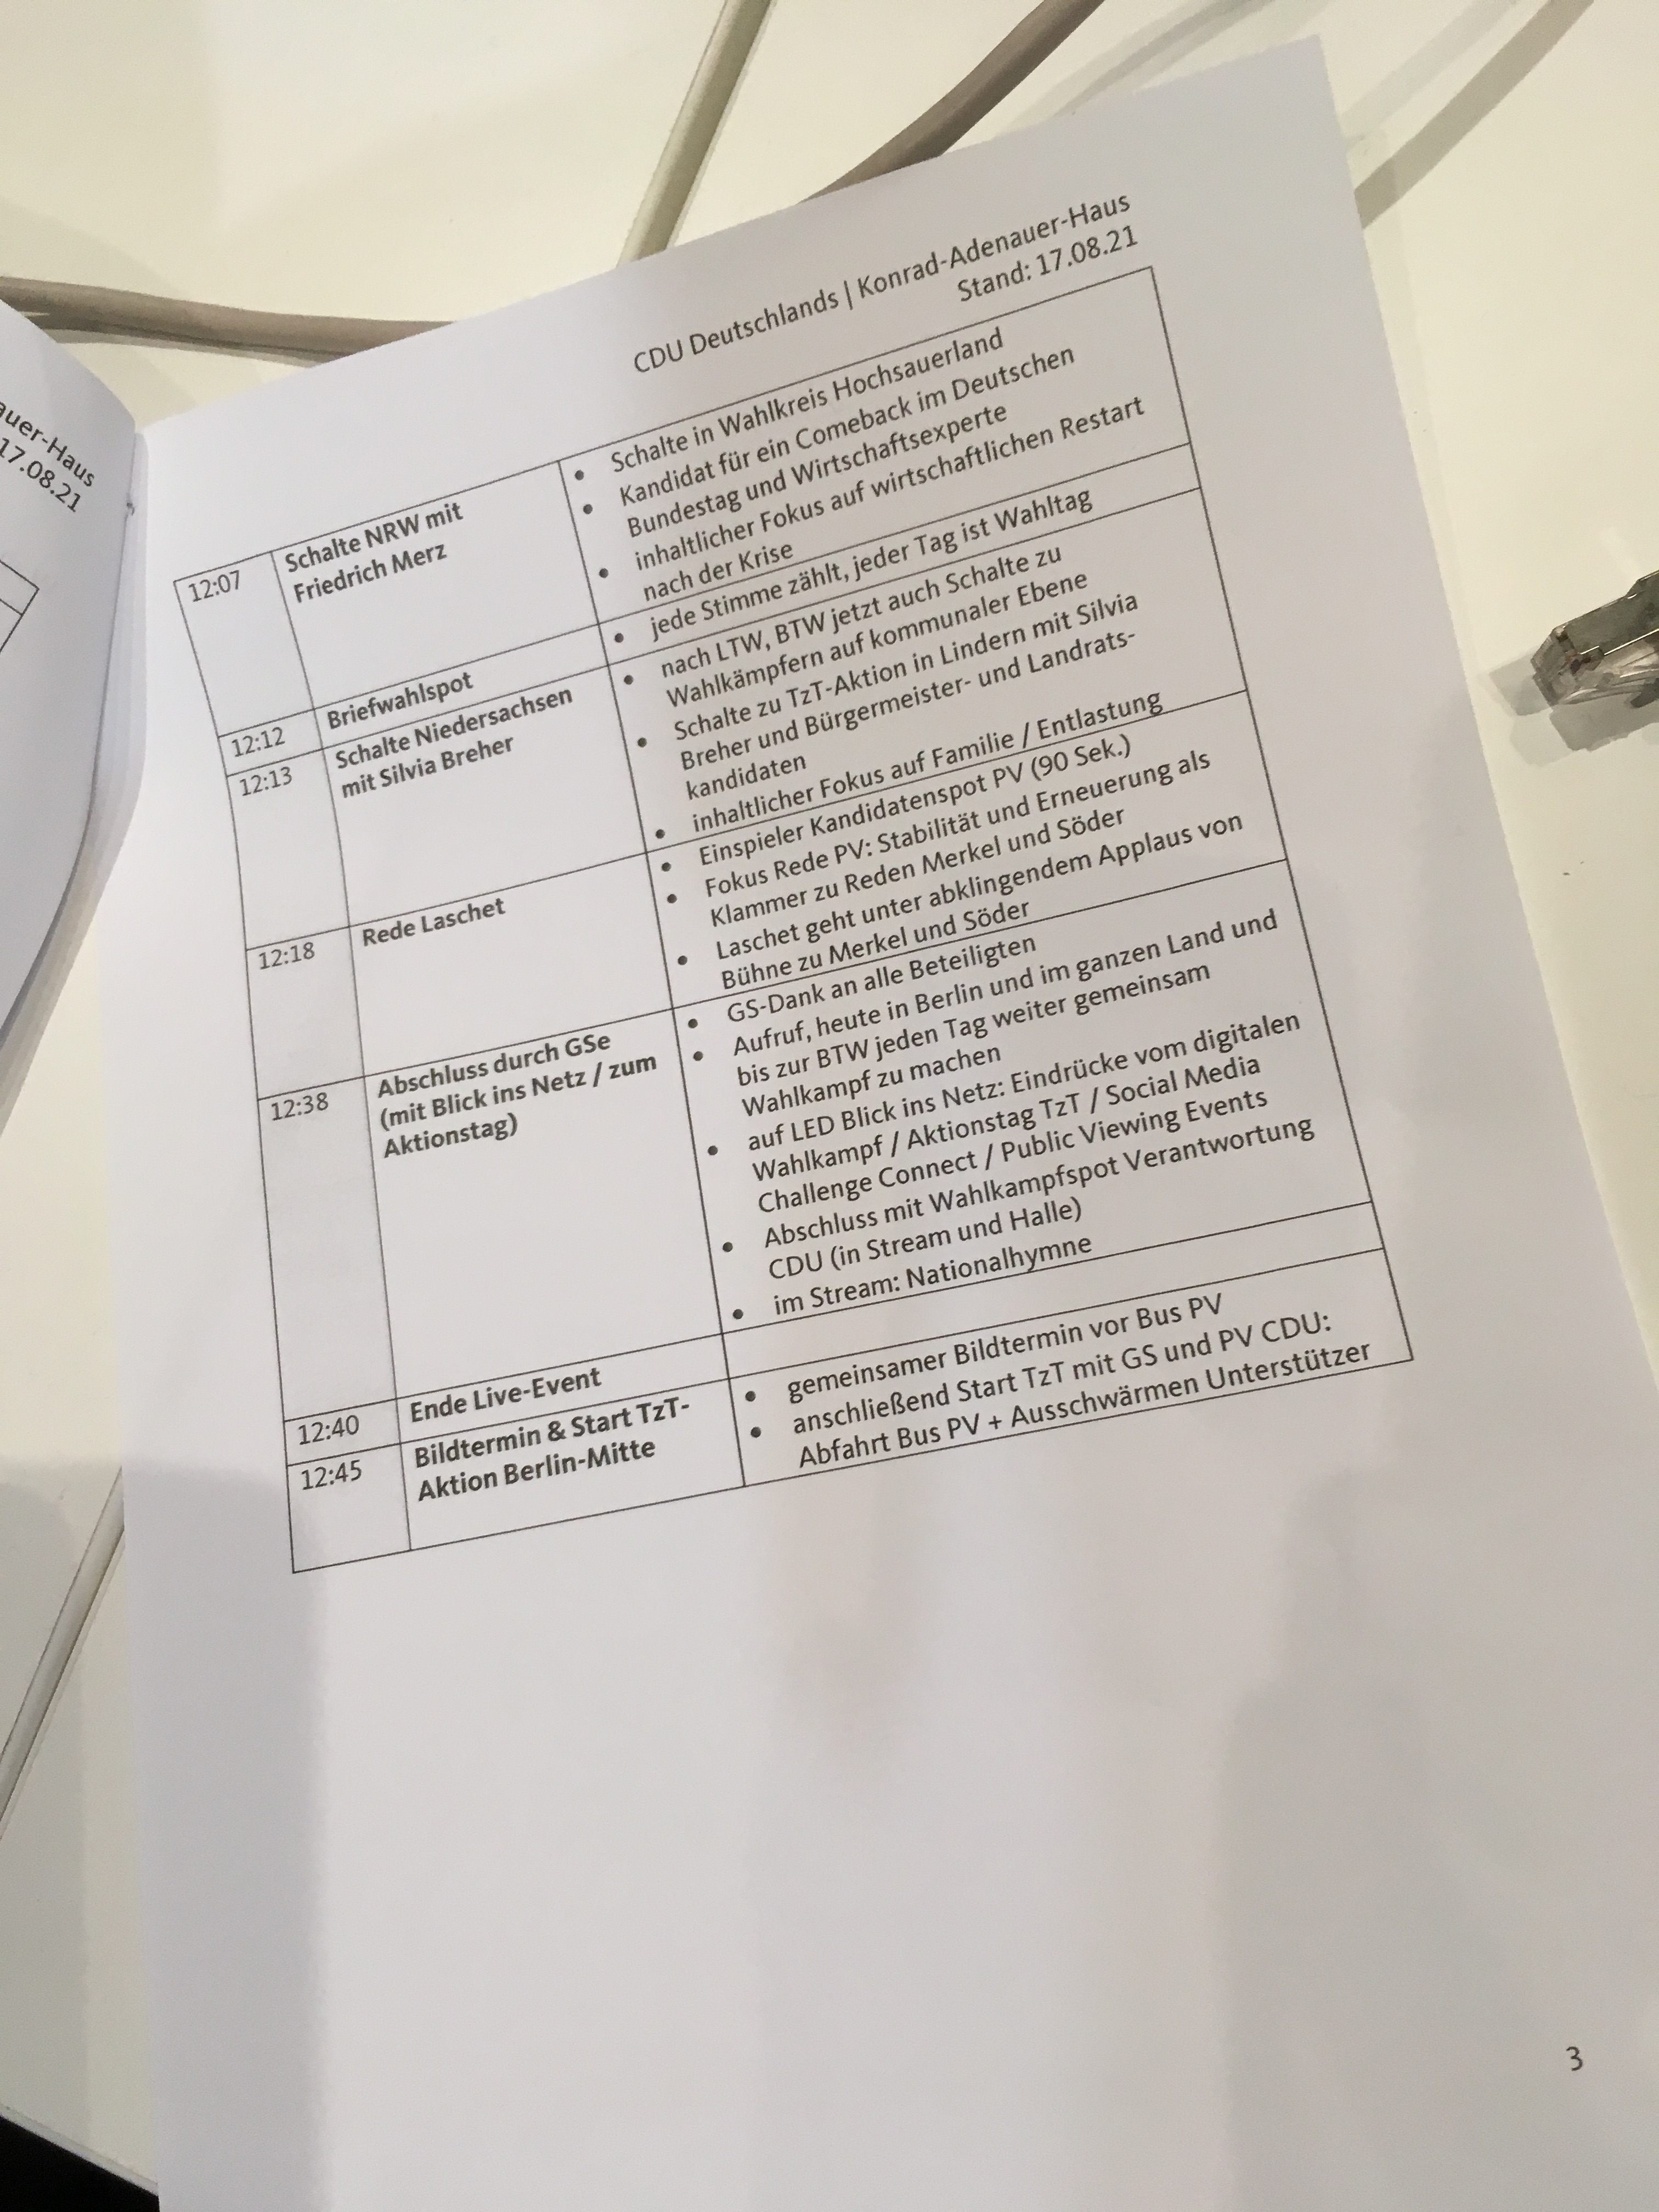 Ablaufplan Wahlkampfauftakt CDU/CSU 2021